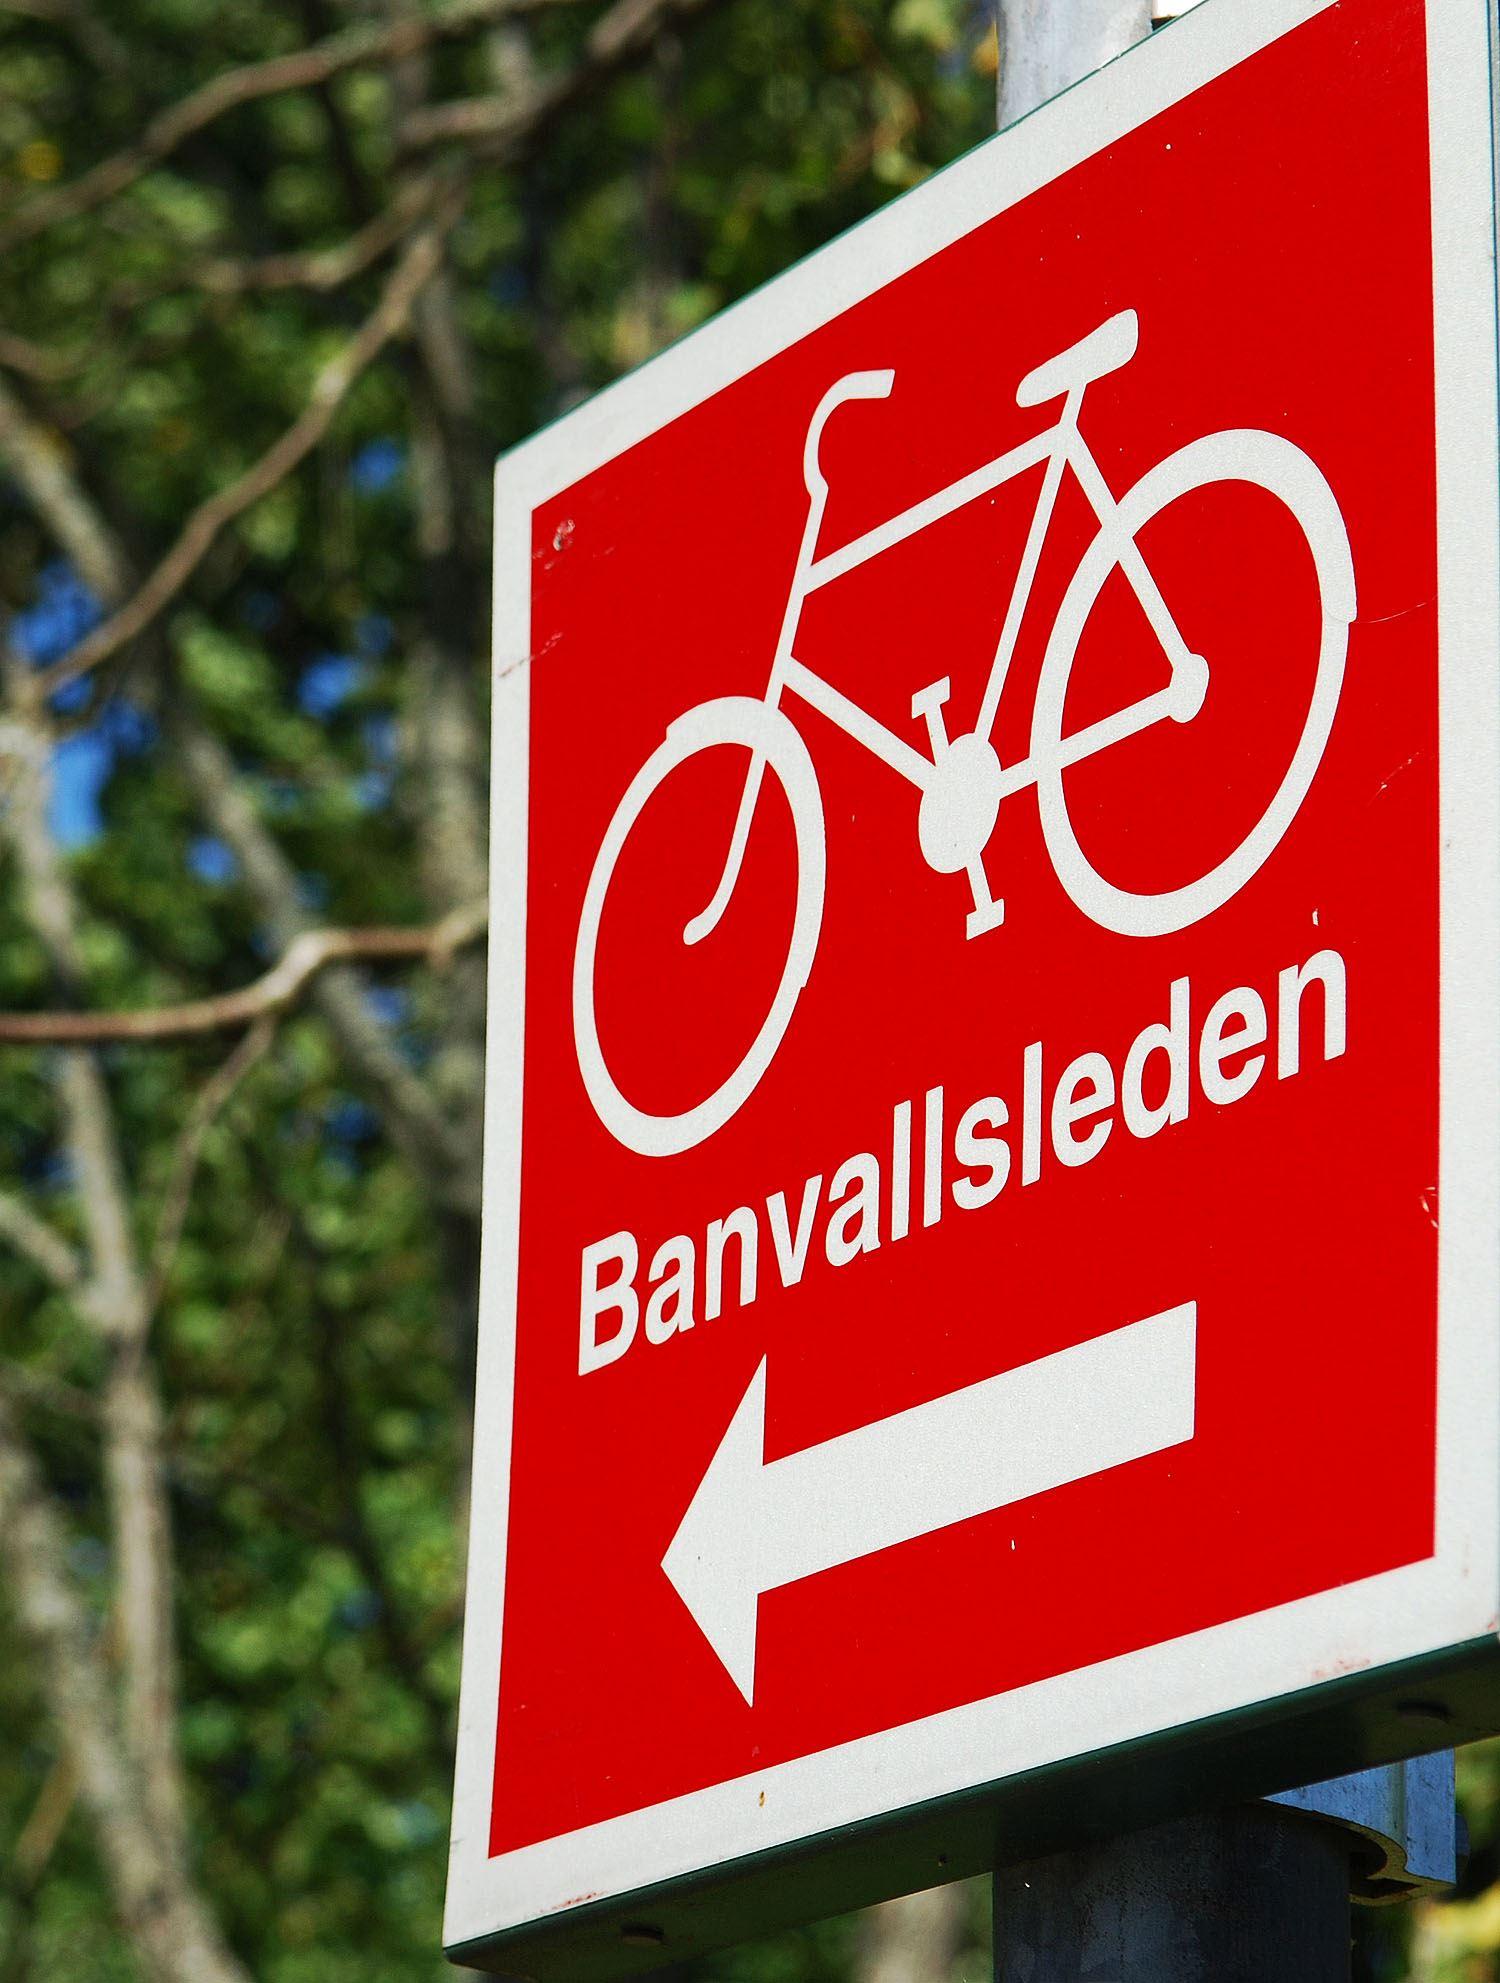 Tobias Delfin, Banvallsleden